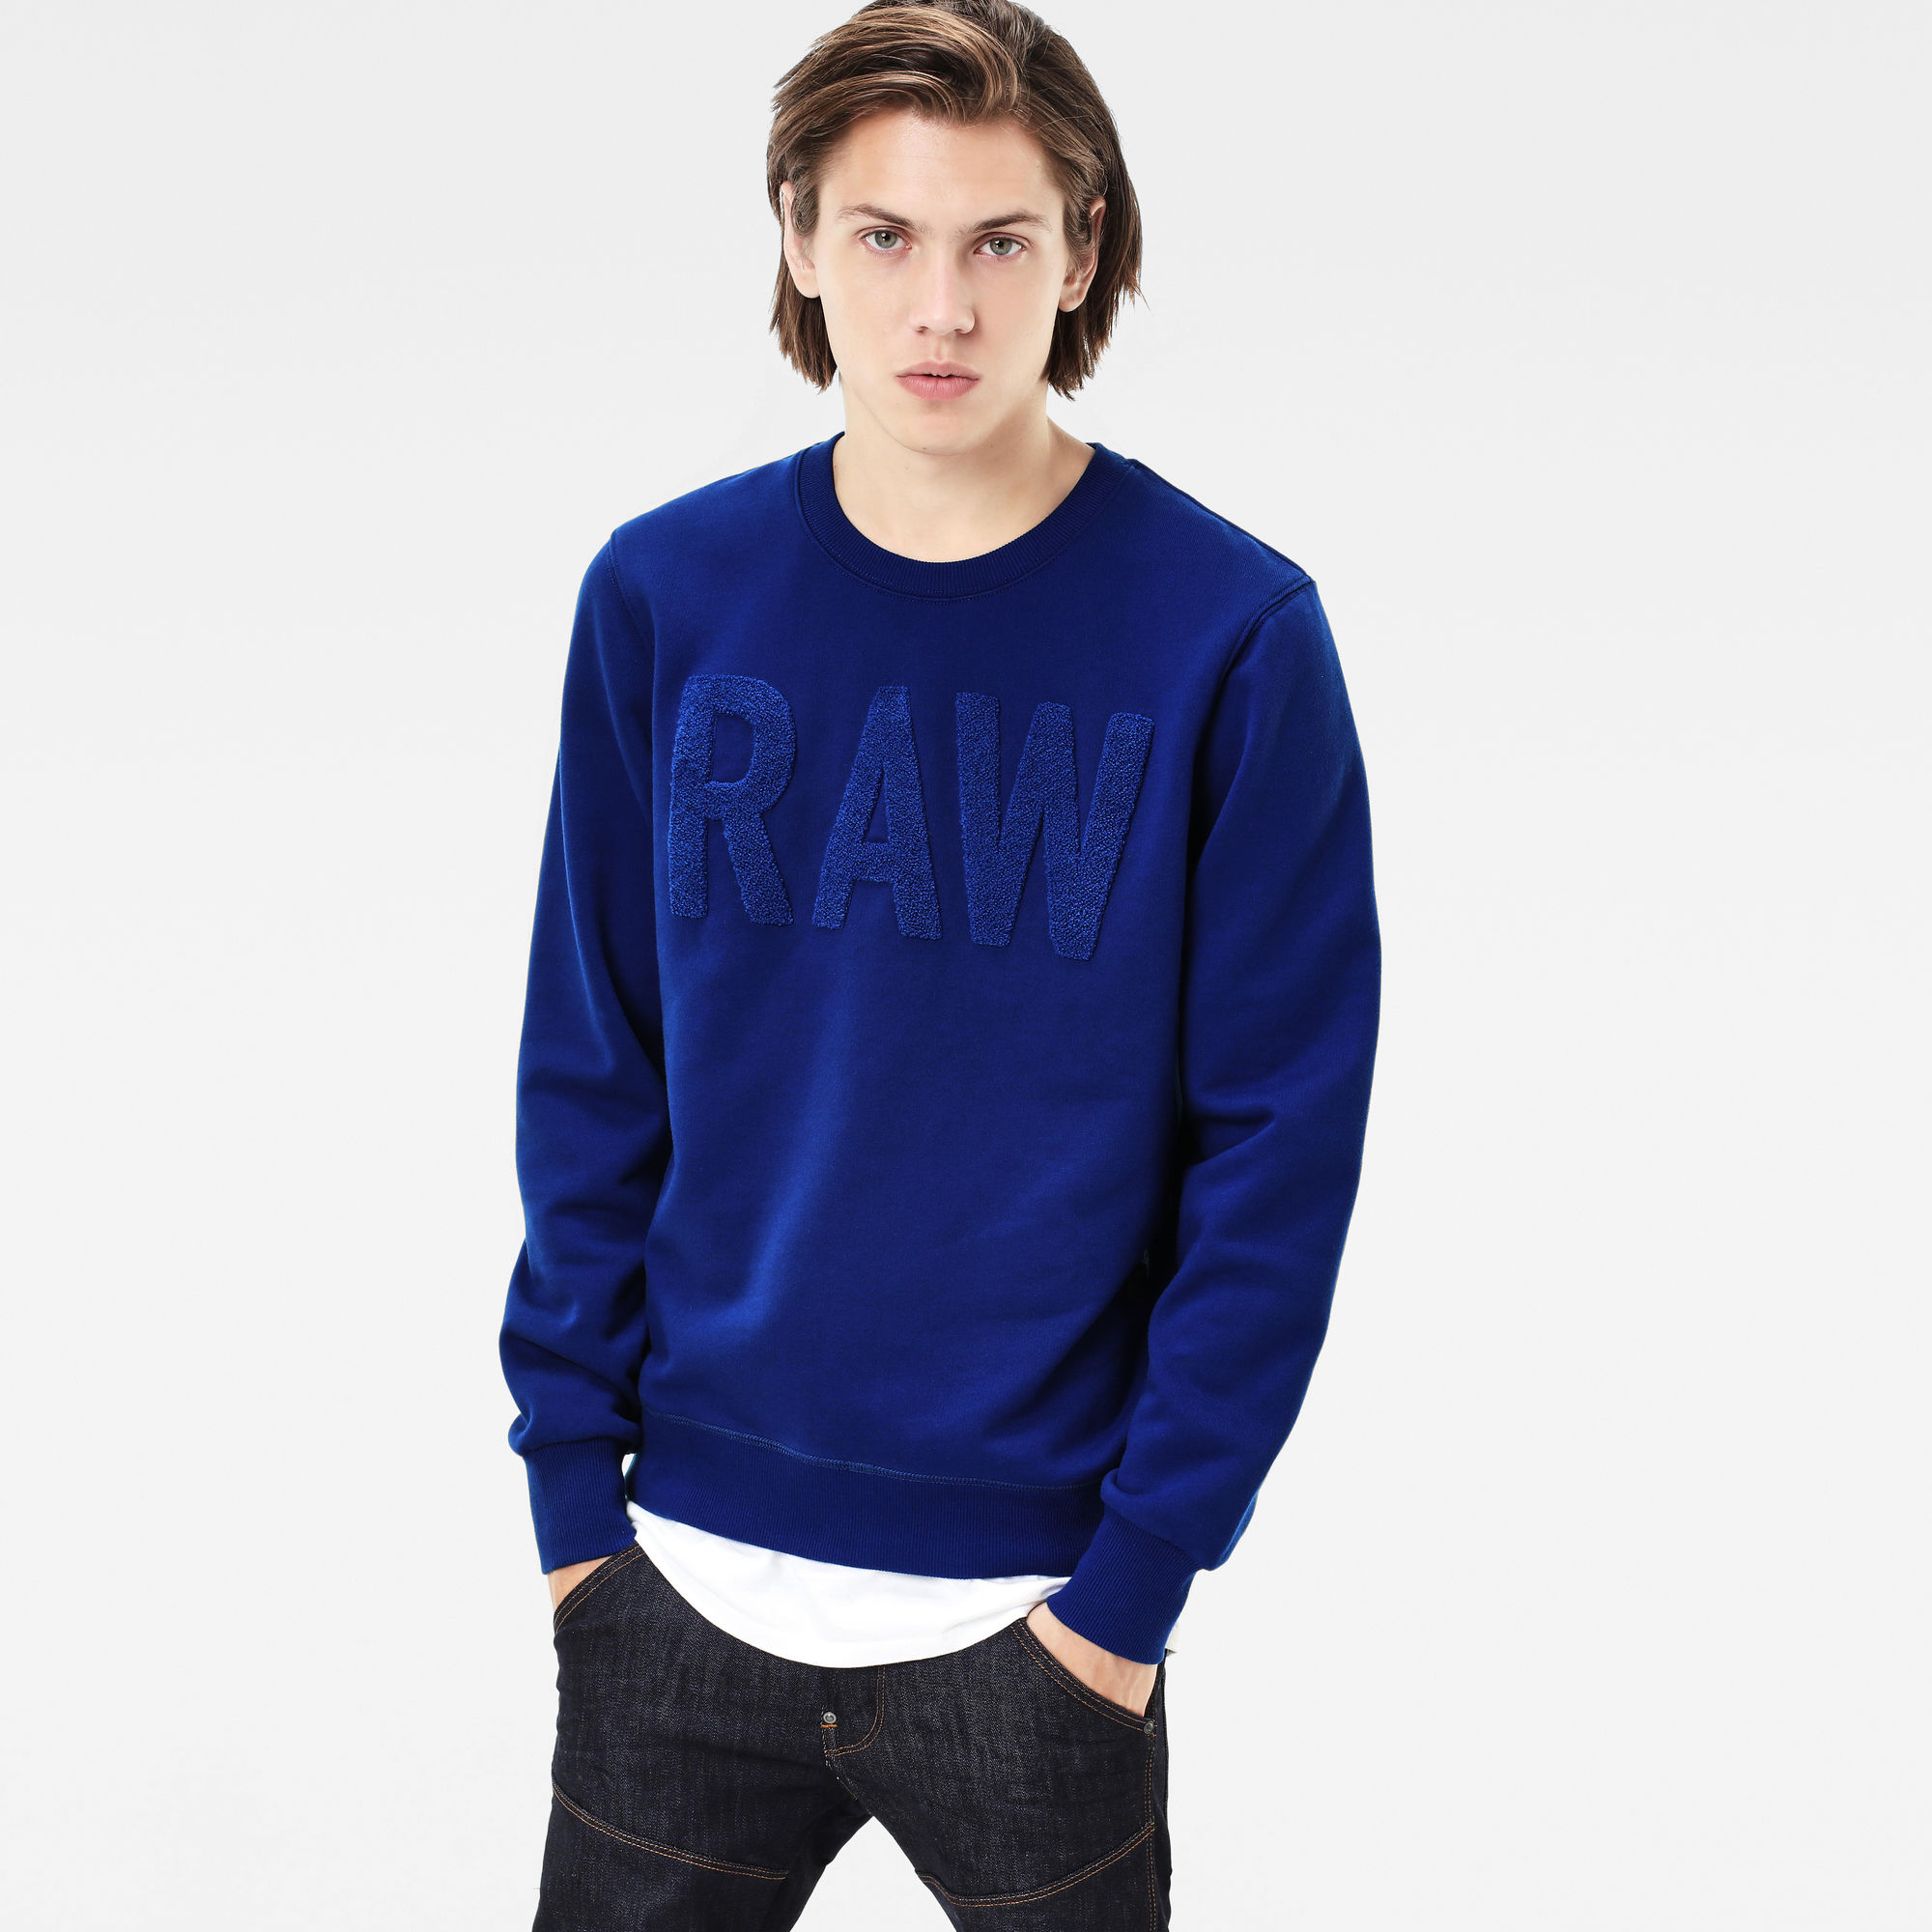 Strijsk Sweater